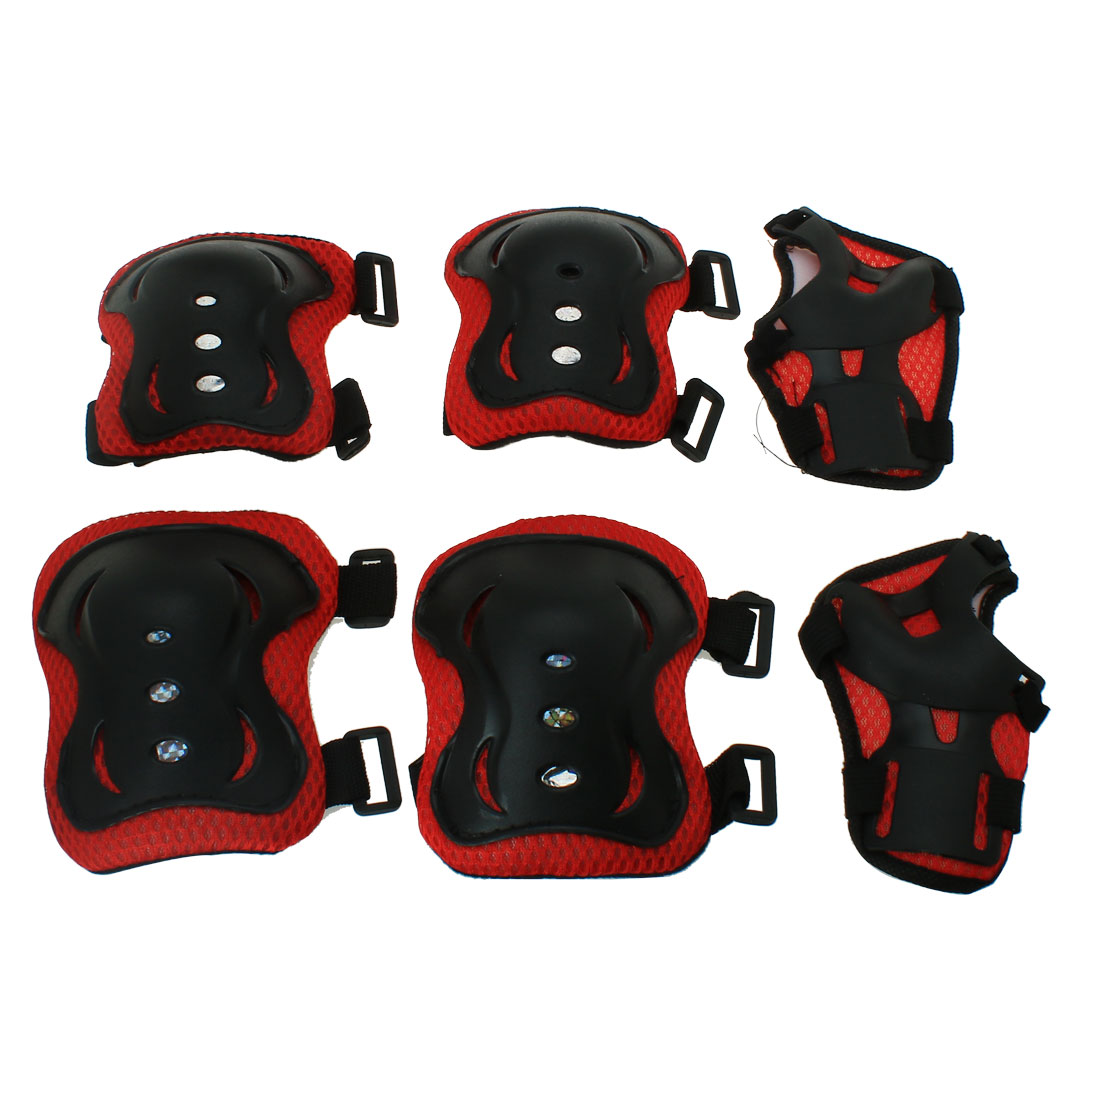 6pcs Kids Elbow Knee Pads Palm Wrist Guard Set Protective Gear